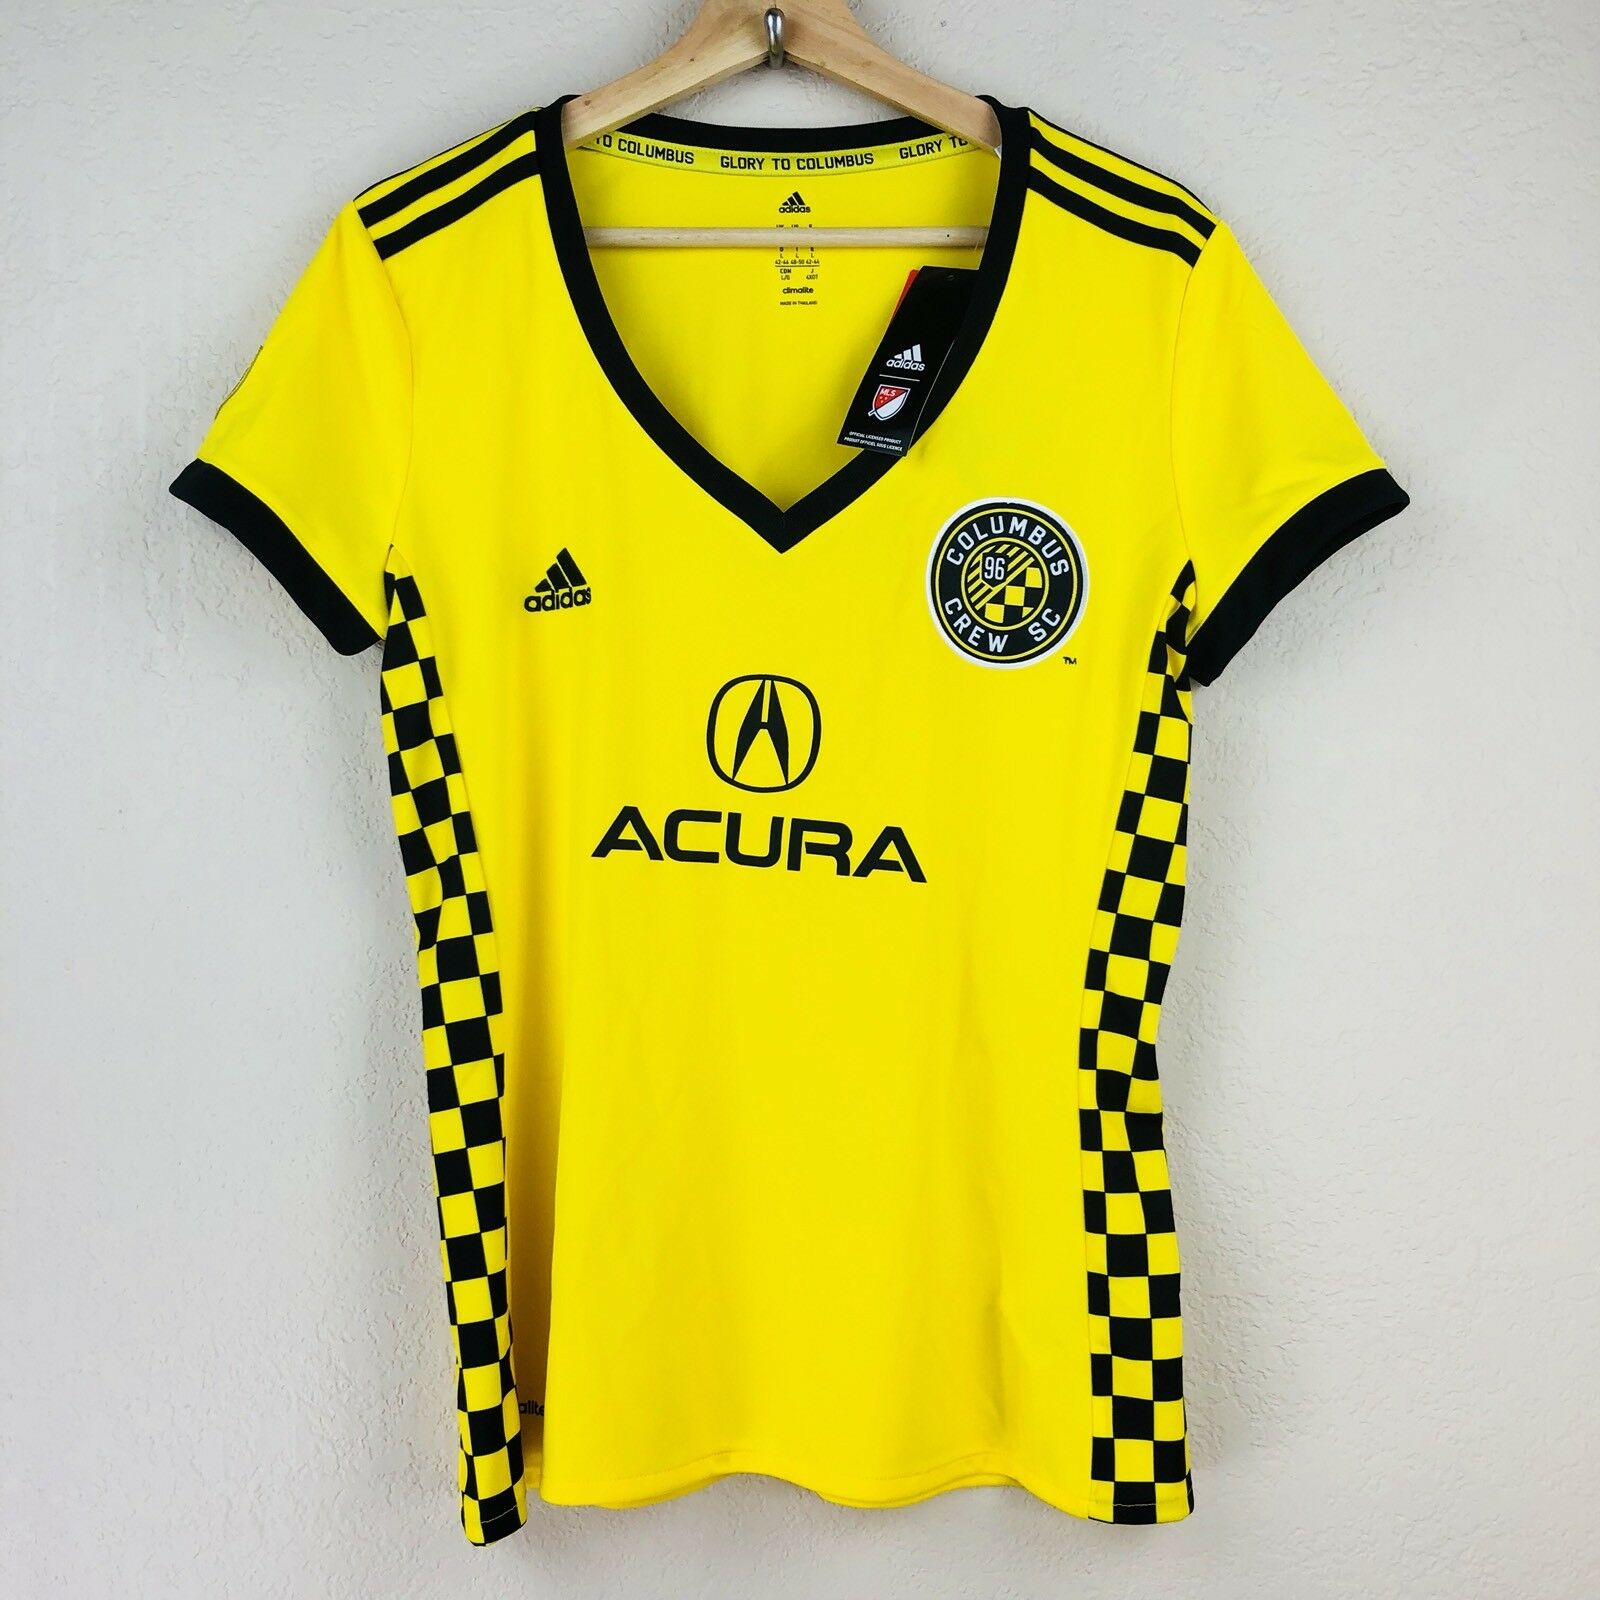 NWT ADIDAS Columbus Crew MLS 2016 Jersey Women SZ Large Acura Yellow V-neck